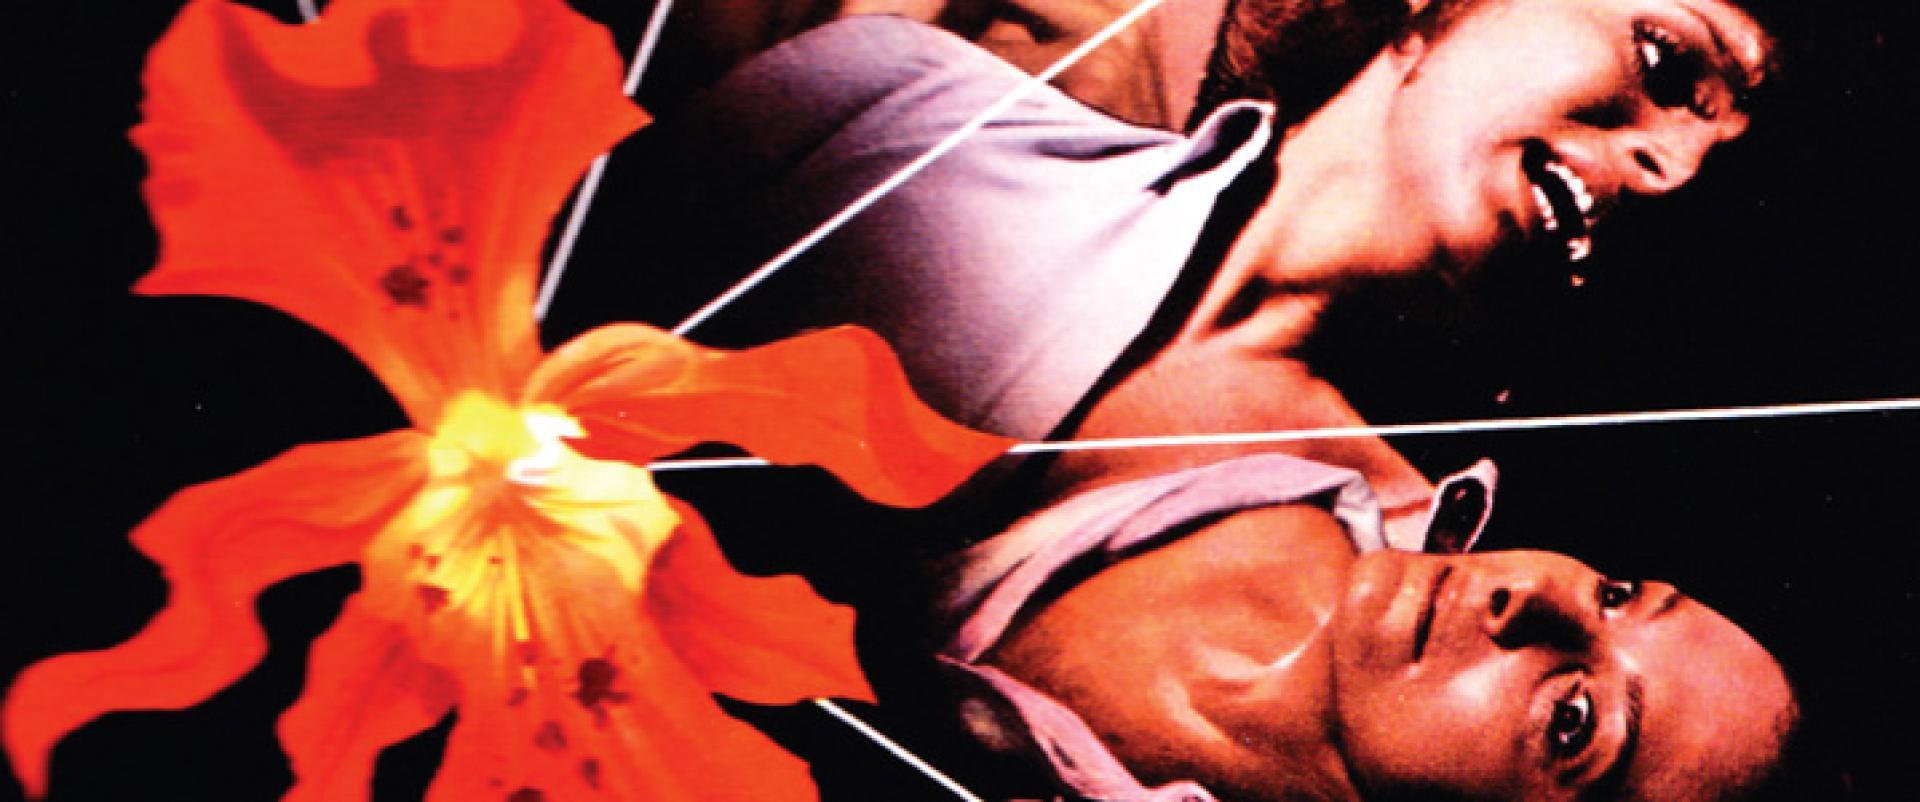 Sette orchidee macchiate di rosso - Hét vérfoltos orchidea (1972)